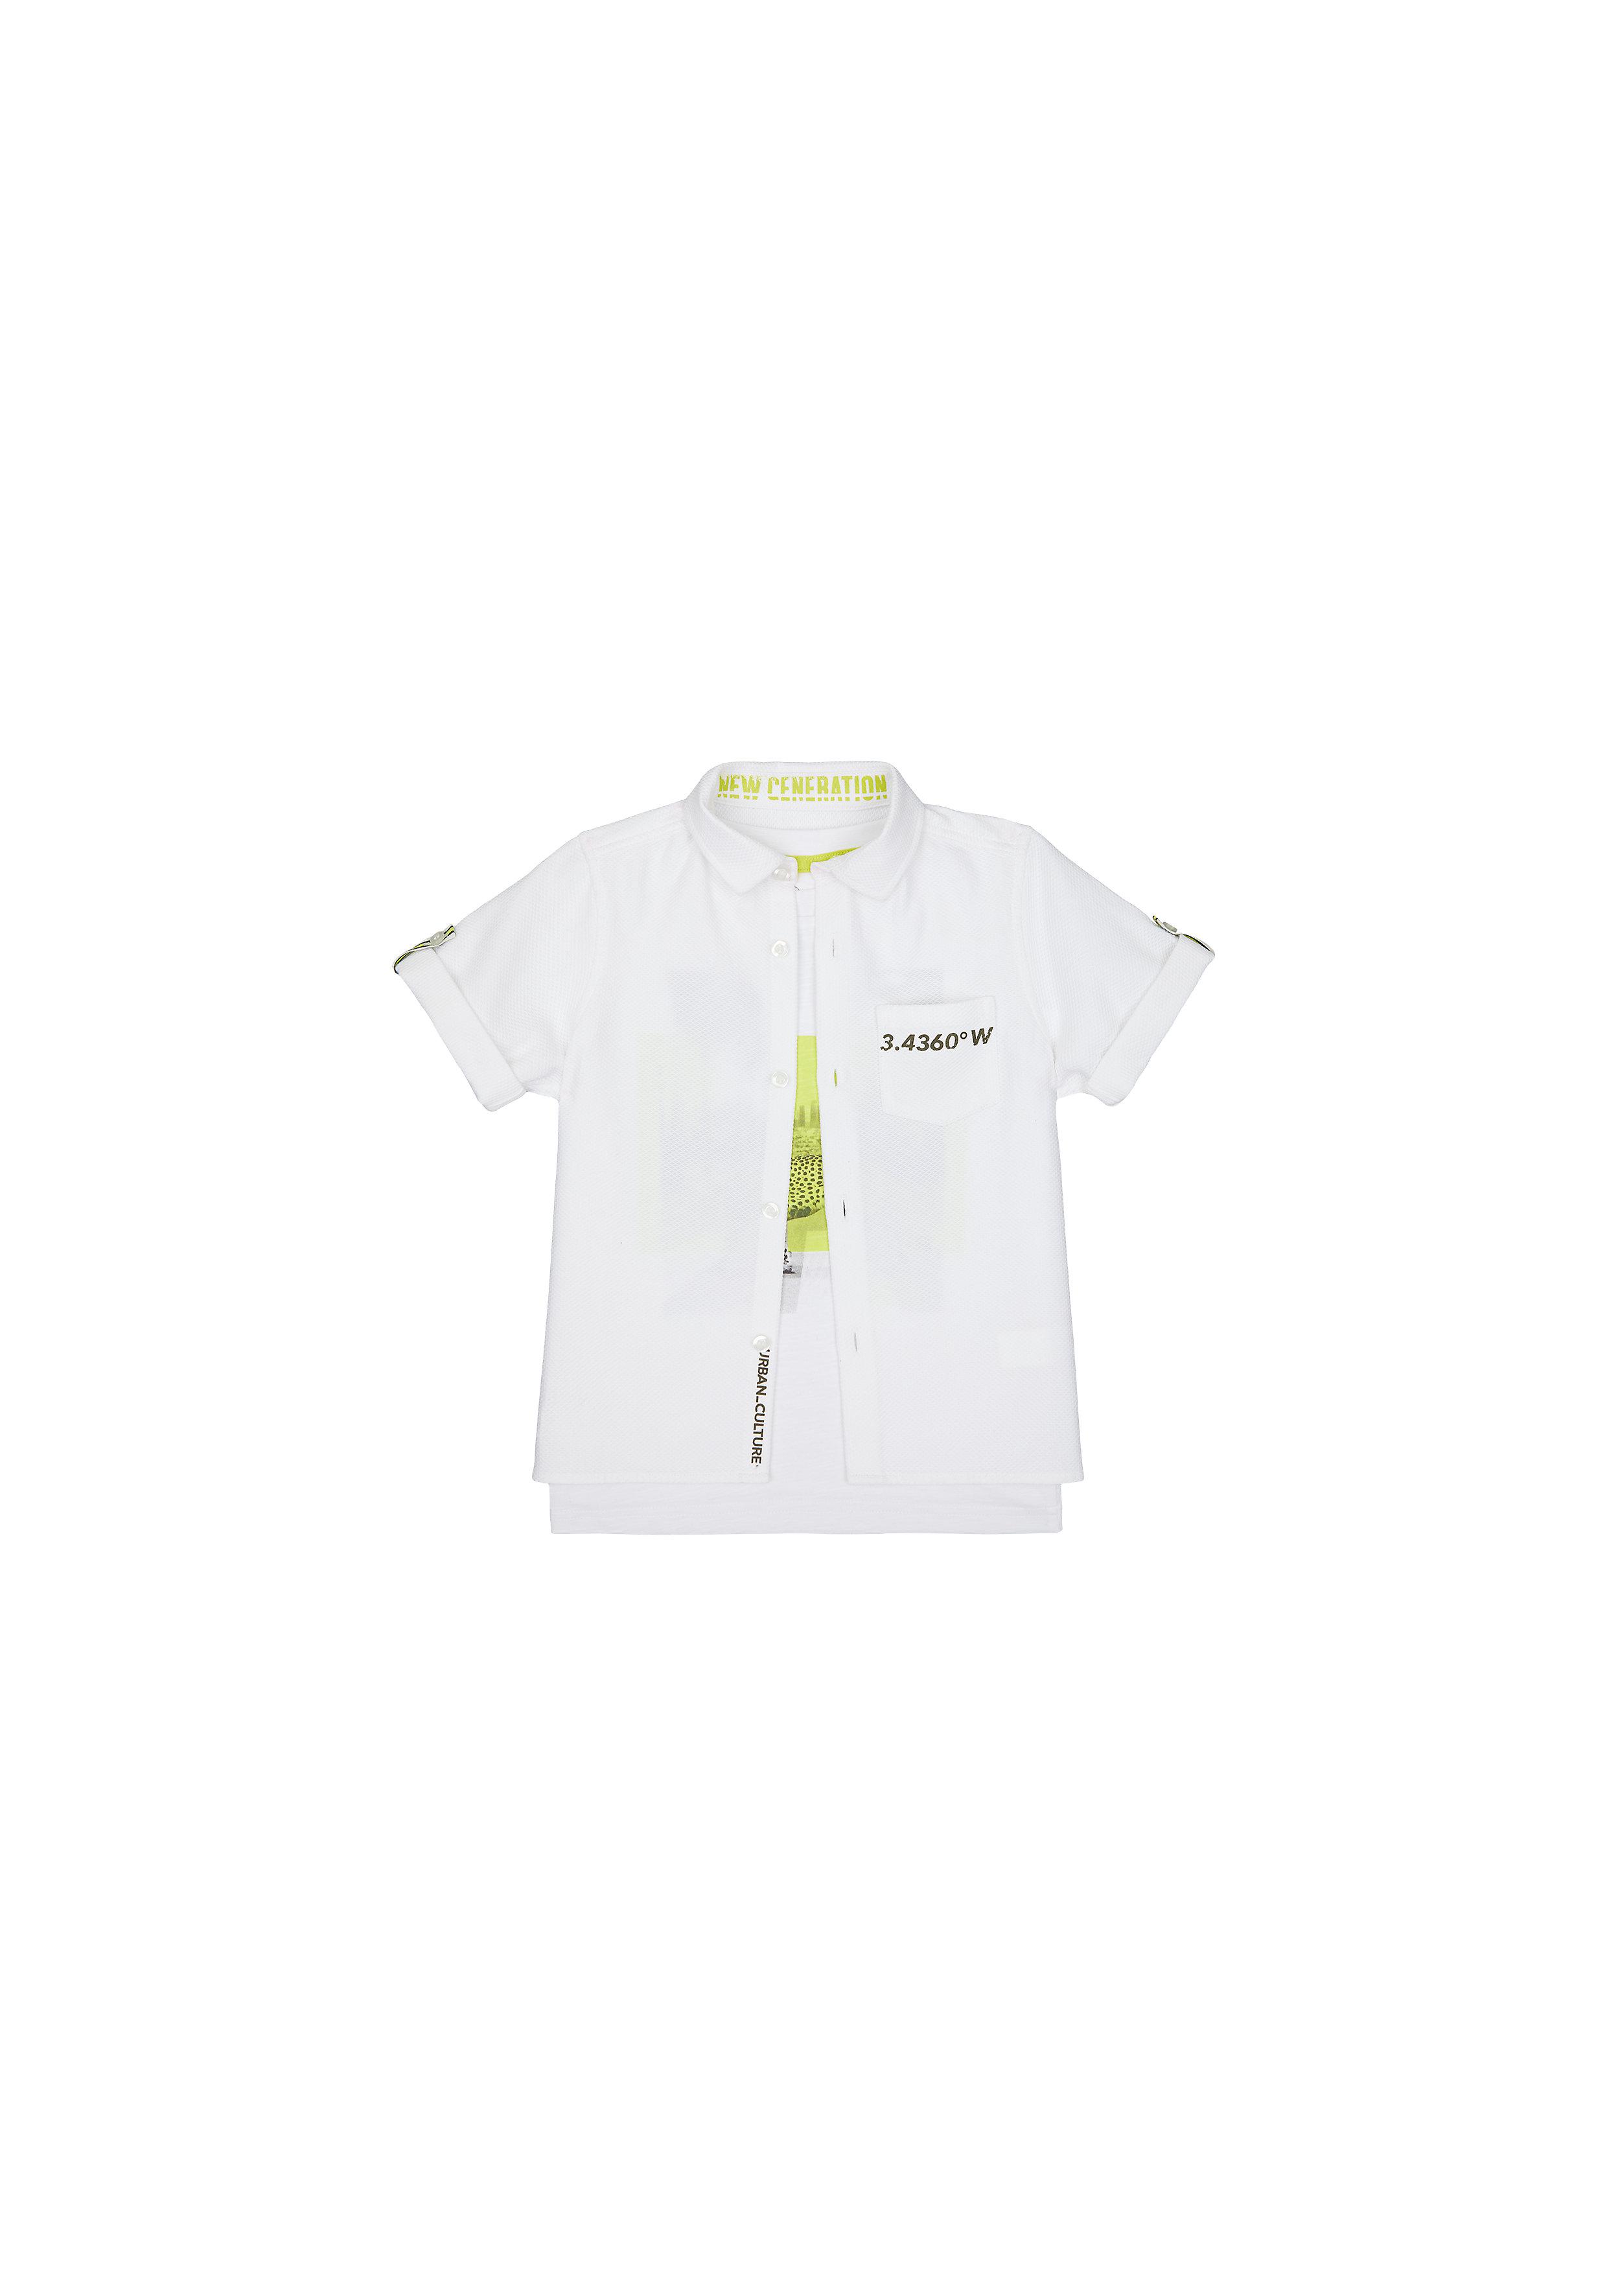 Mothercare | Boys Half Sleeves Shirt And Tee Set Printed - White